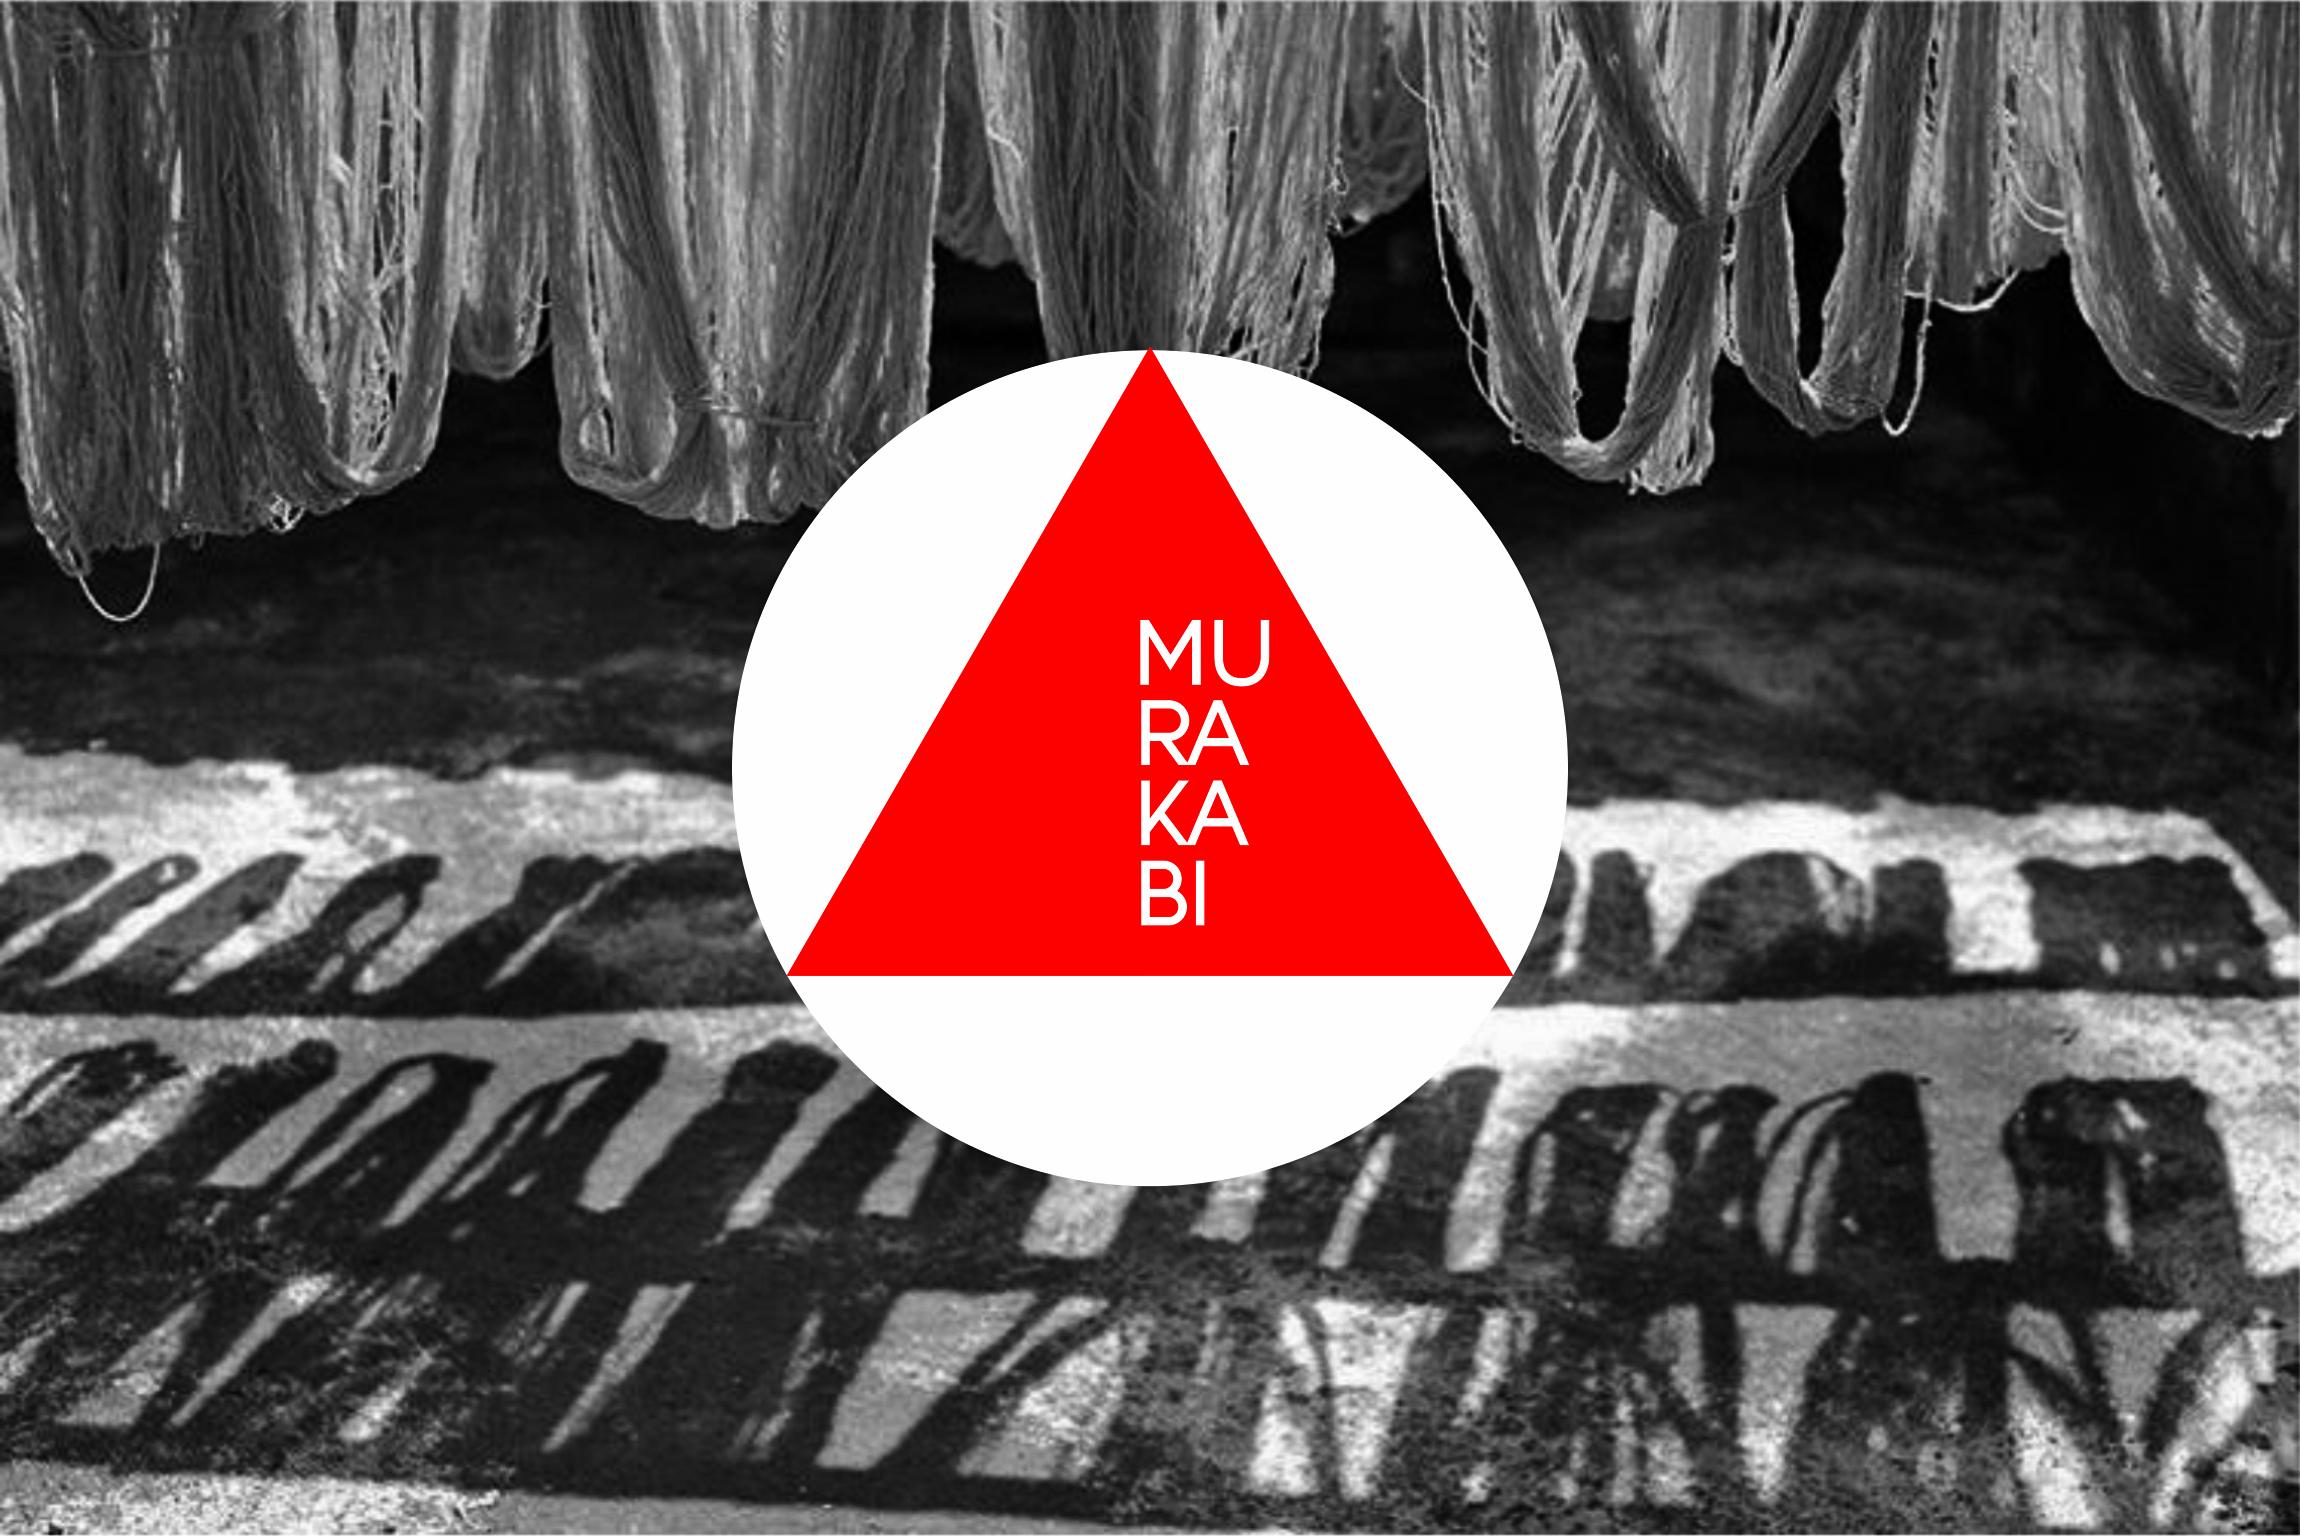 Piramida Gerilya, 'Murakabi', 2019, mixed media installation, dimensions variable. Image courtesy of Jogja National Museum.